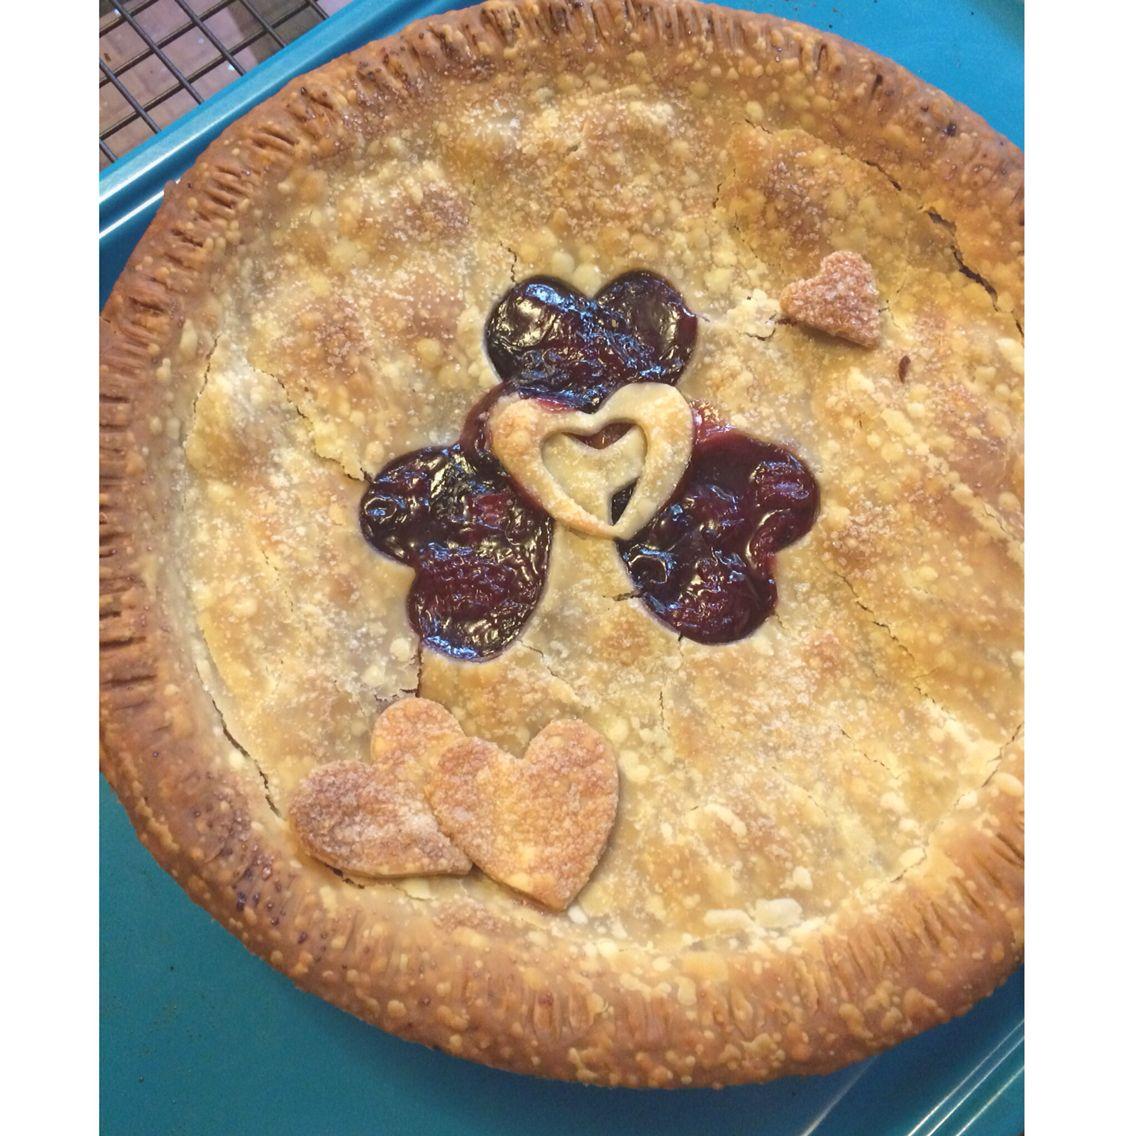 Fresh peach, strawberry & blueberry pie! by Cloud 9 Bakery in Miami | www.cloud9bakerycafe.com